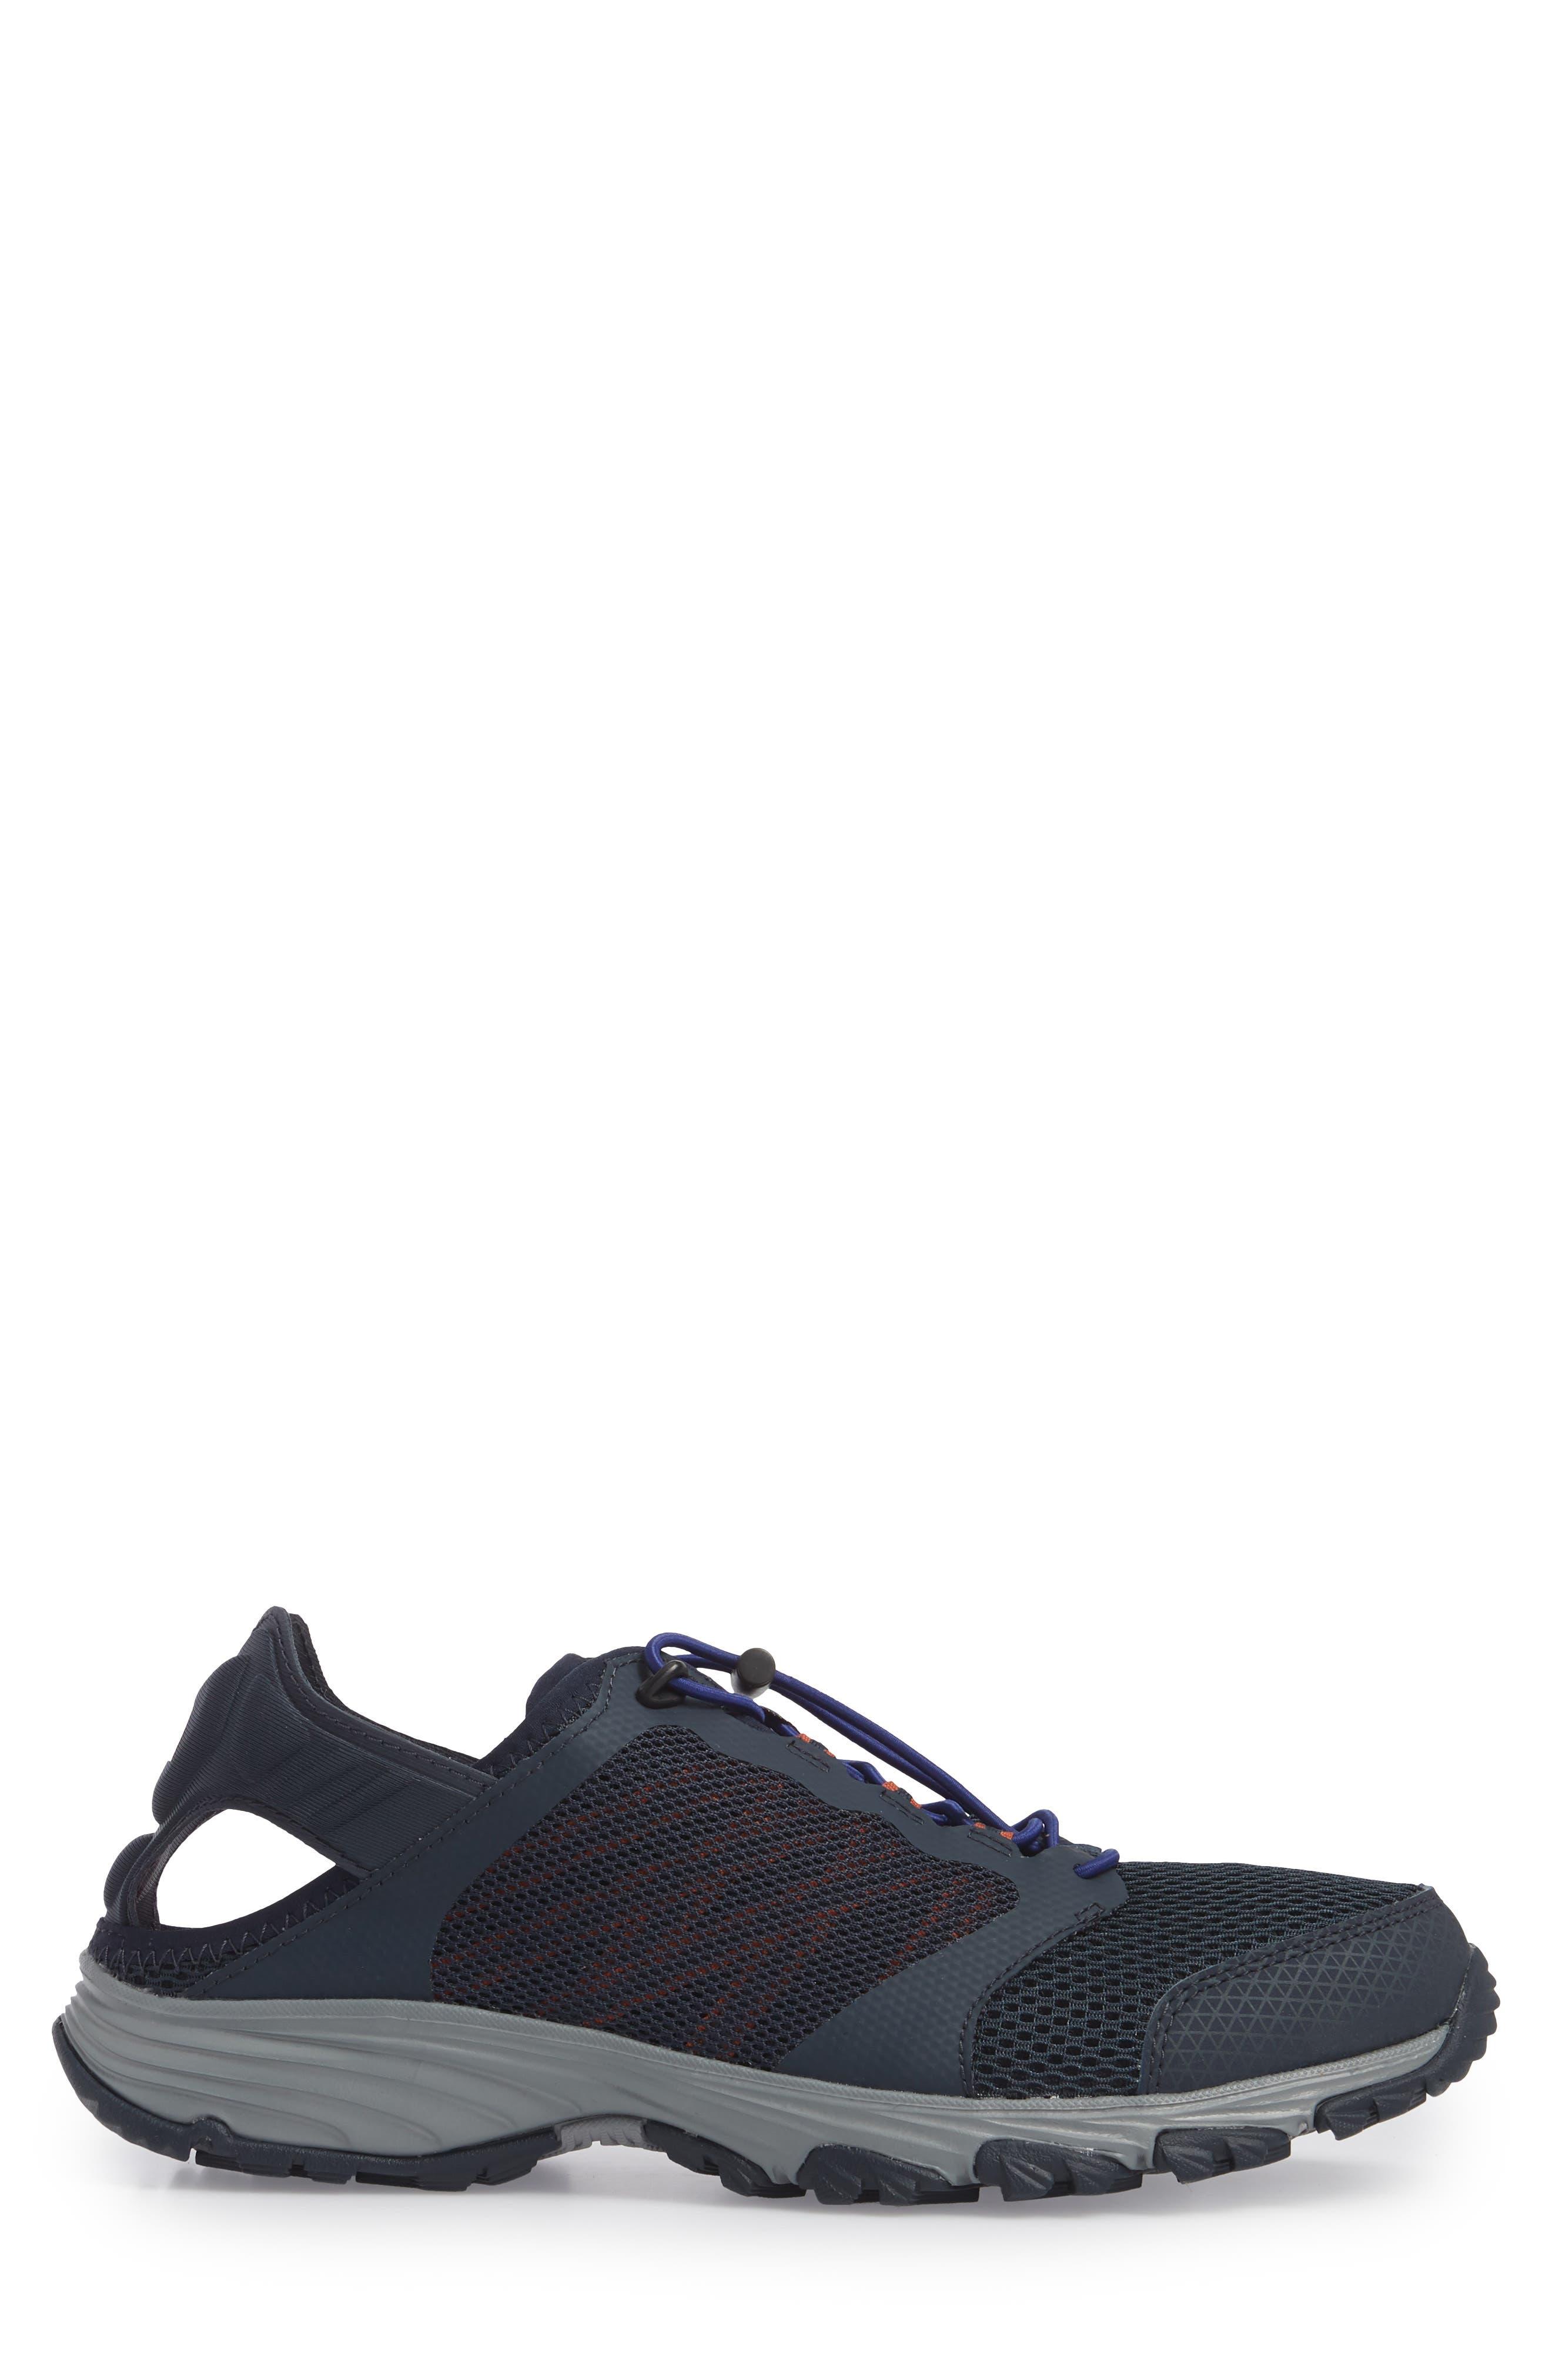 Litewave Amphibious II Collapsible Sneaker,                             Alternate thumbnail 3, color,                             400